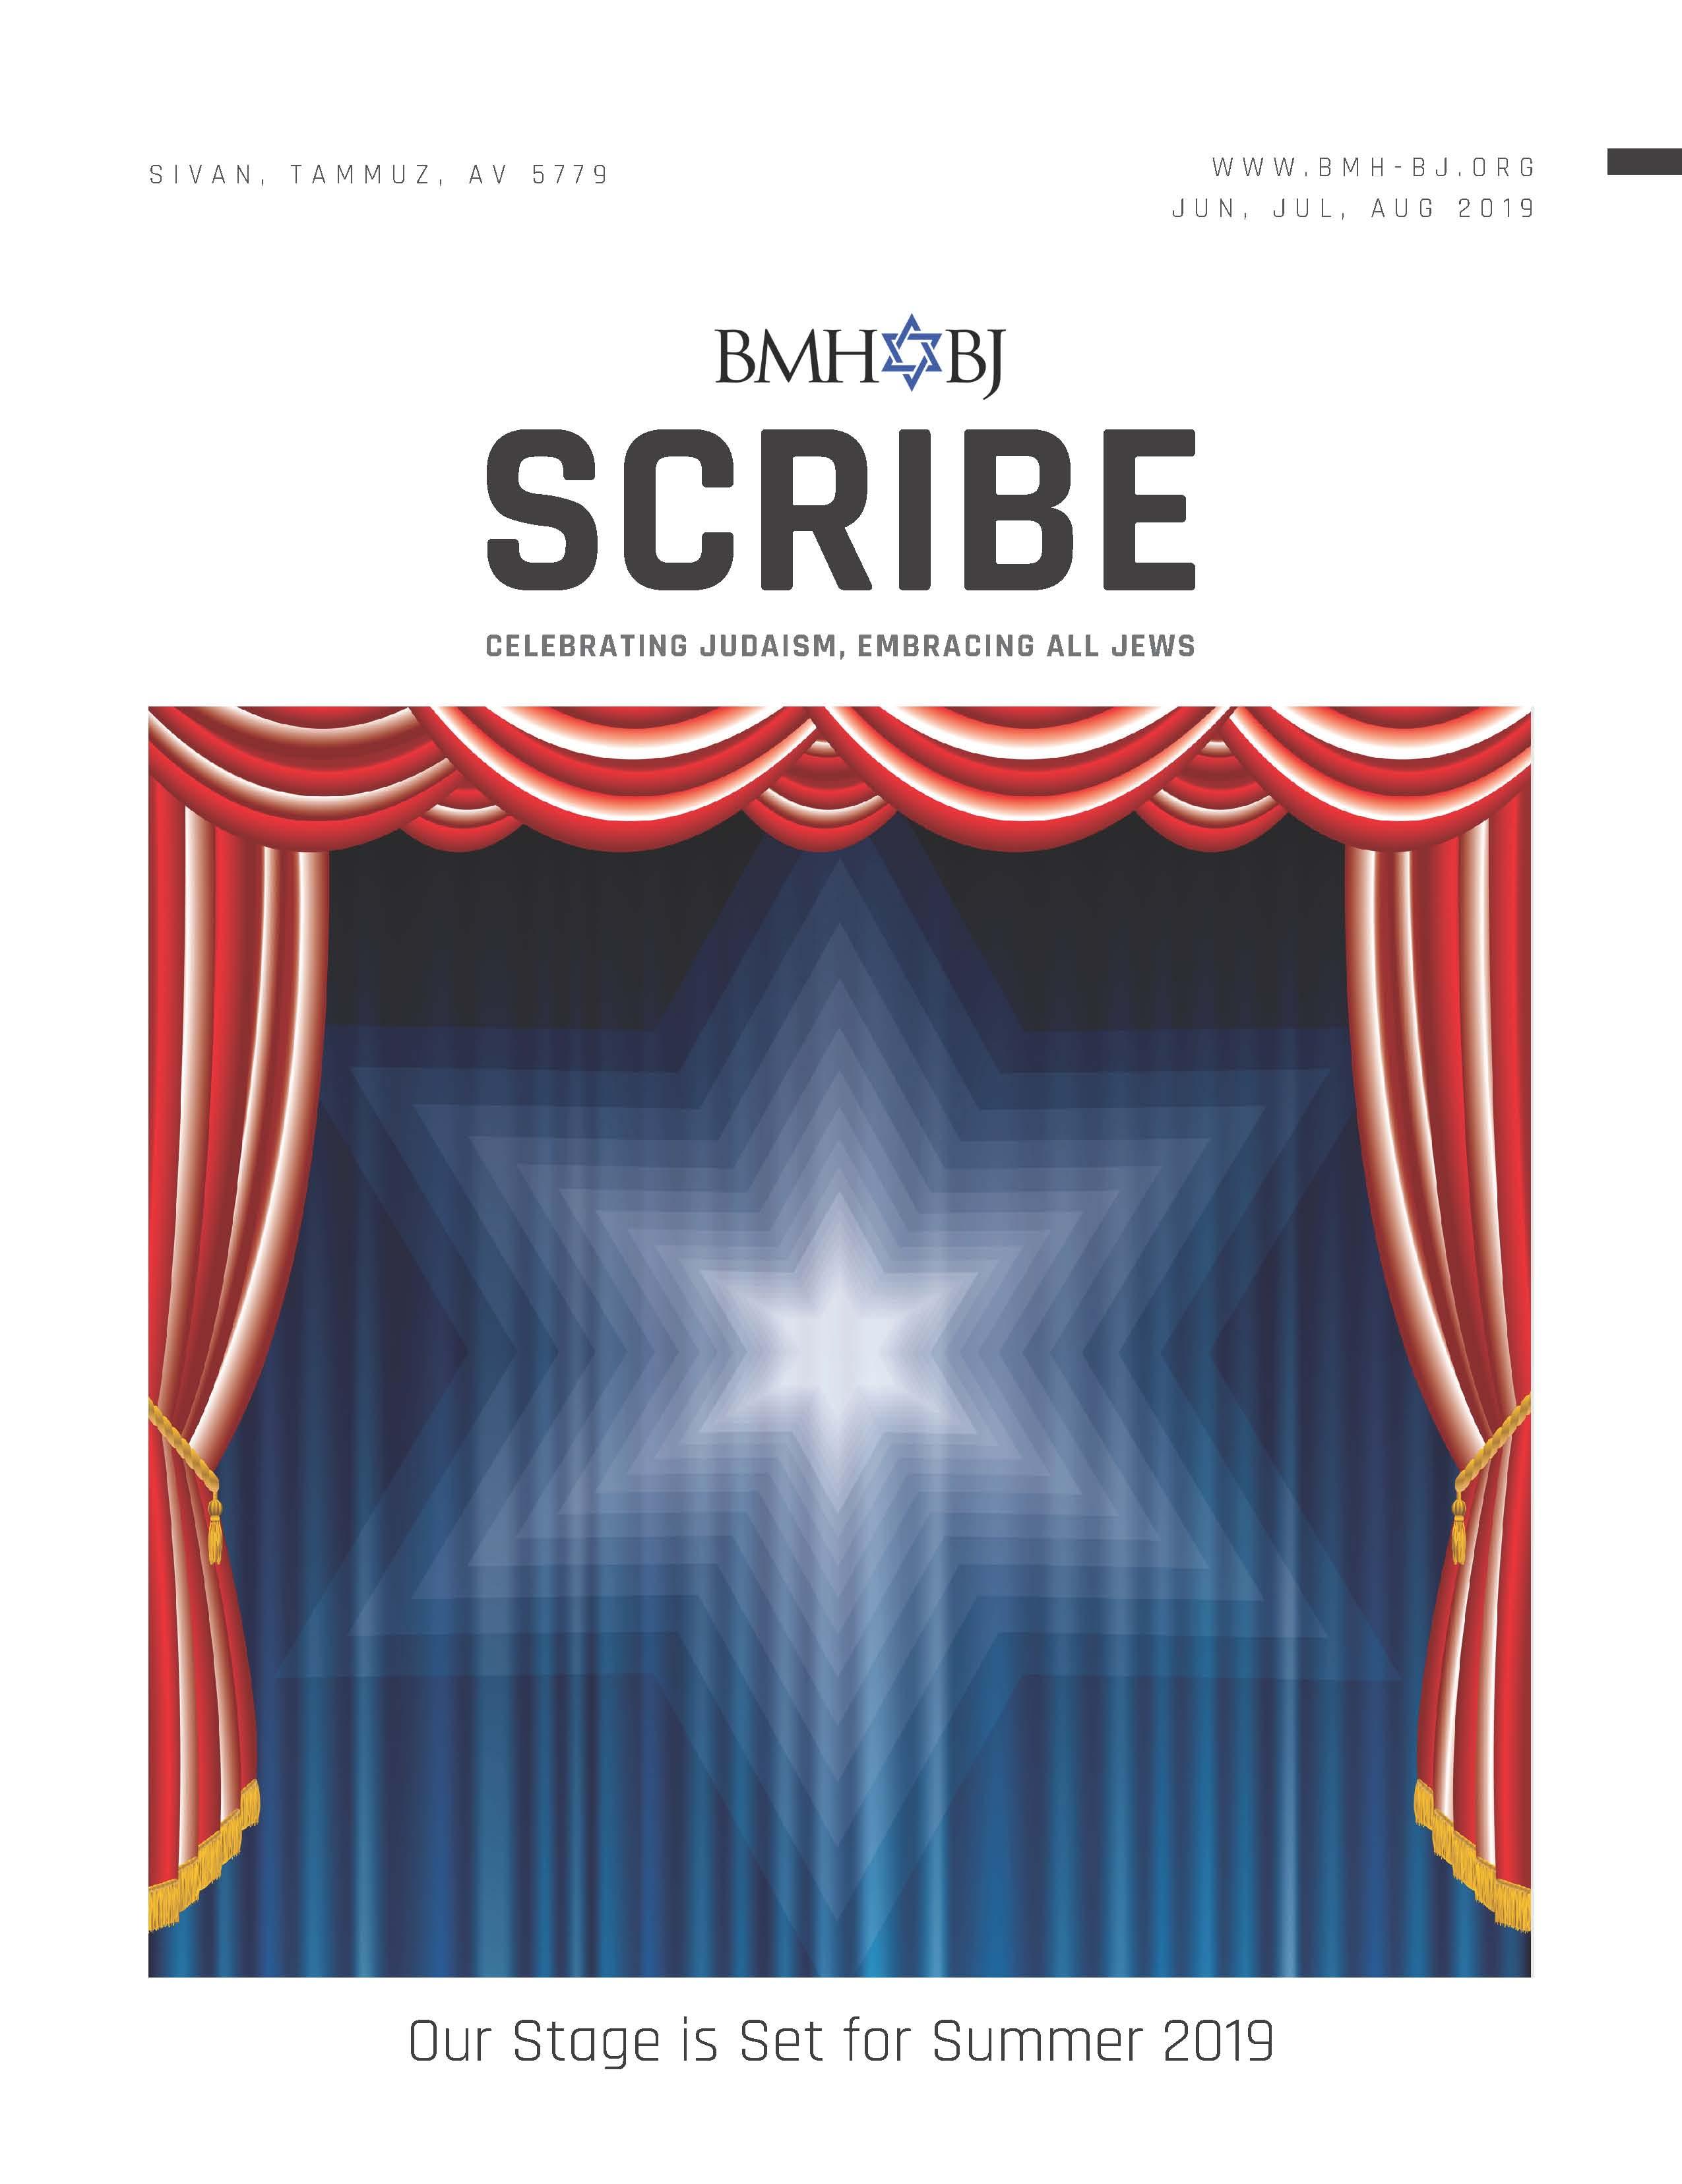 Read the Scribe - BMH-BJ Congregation